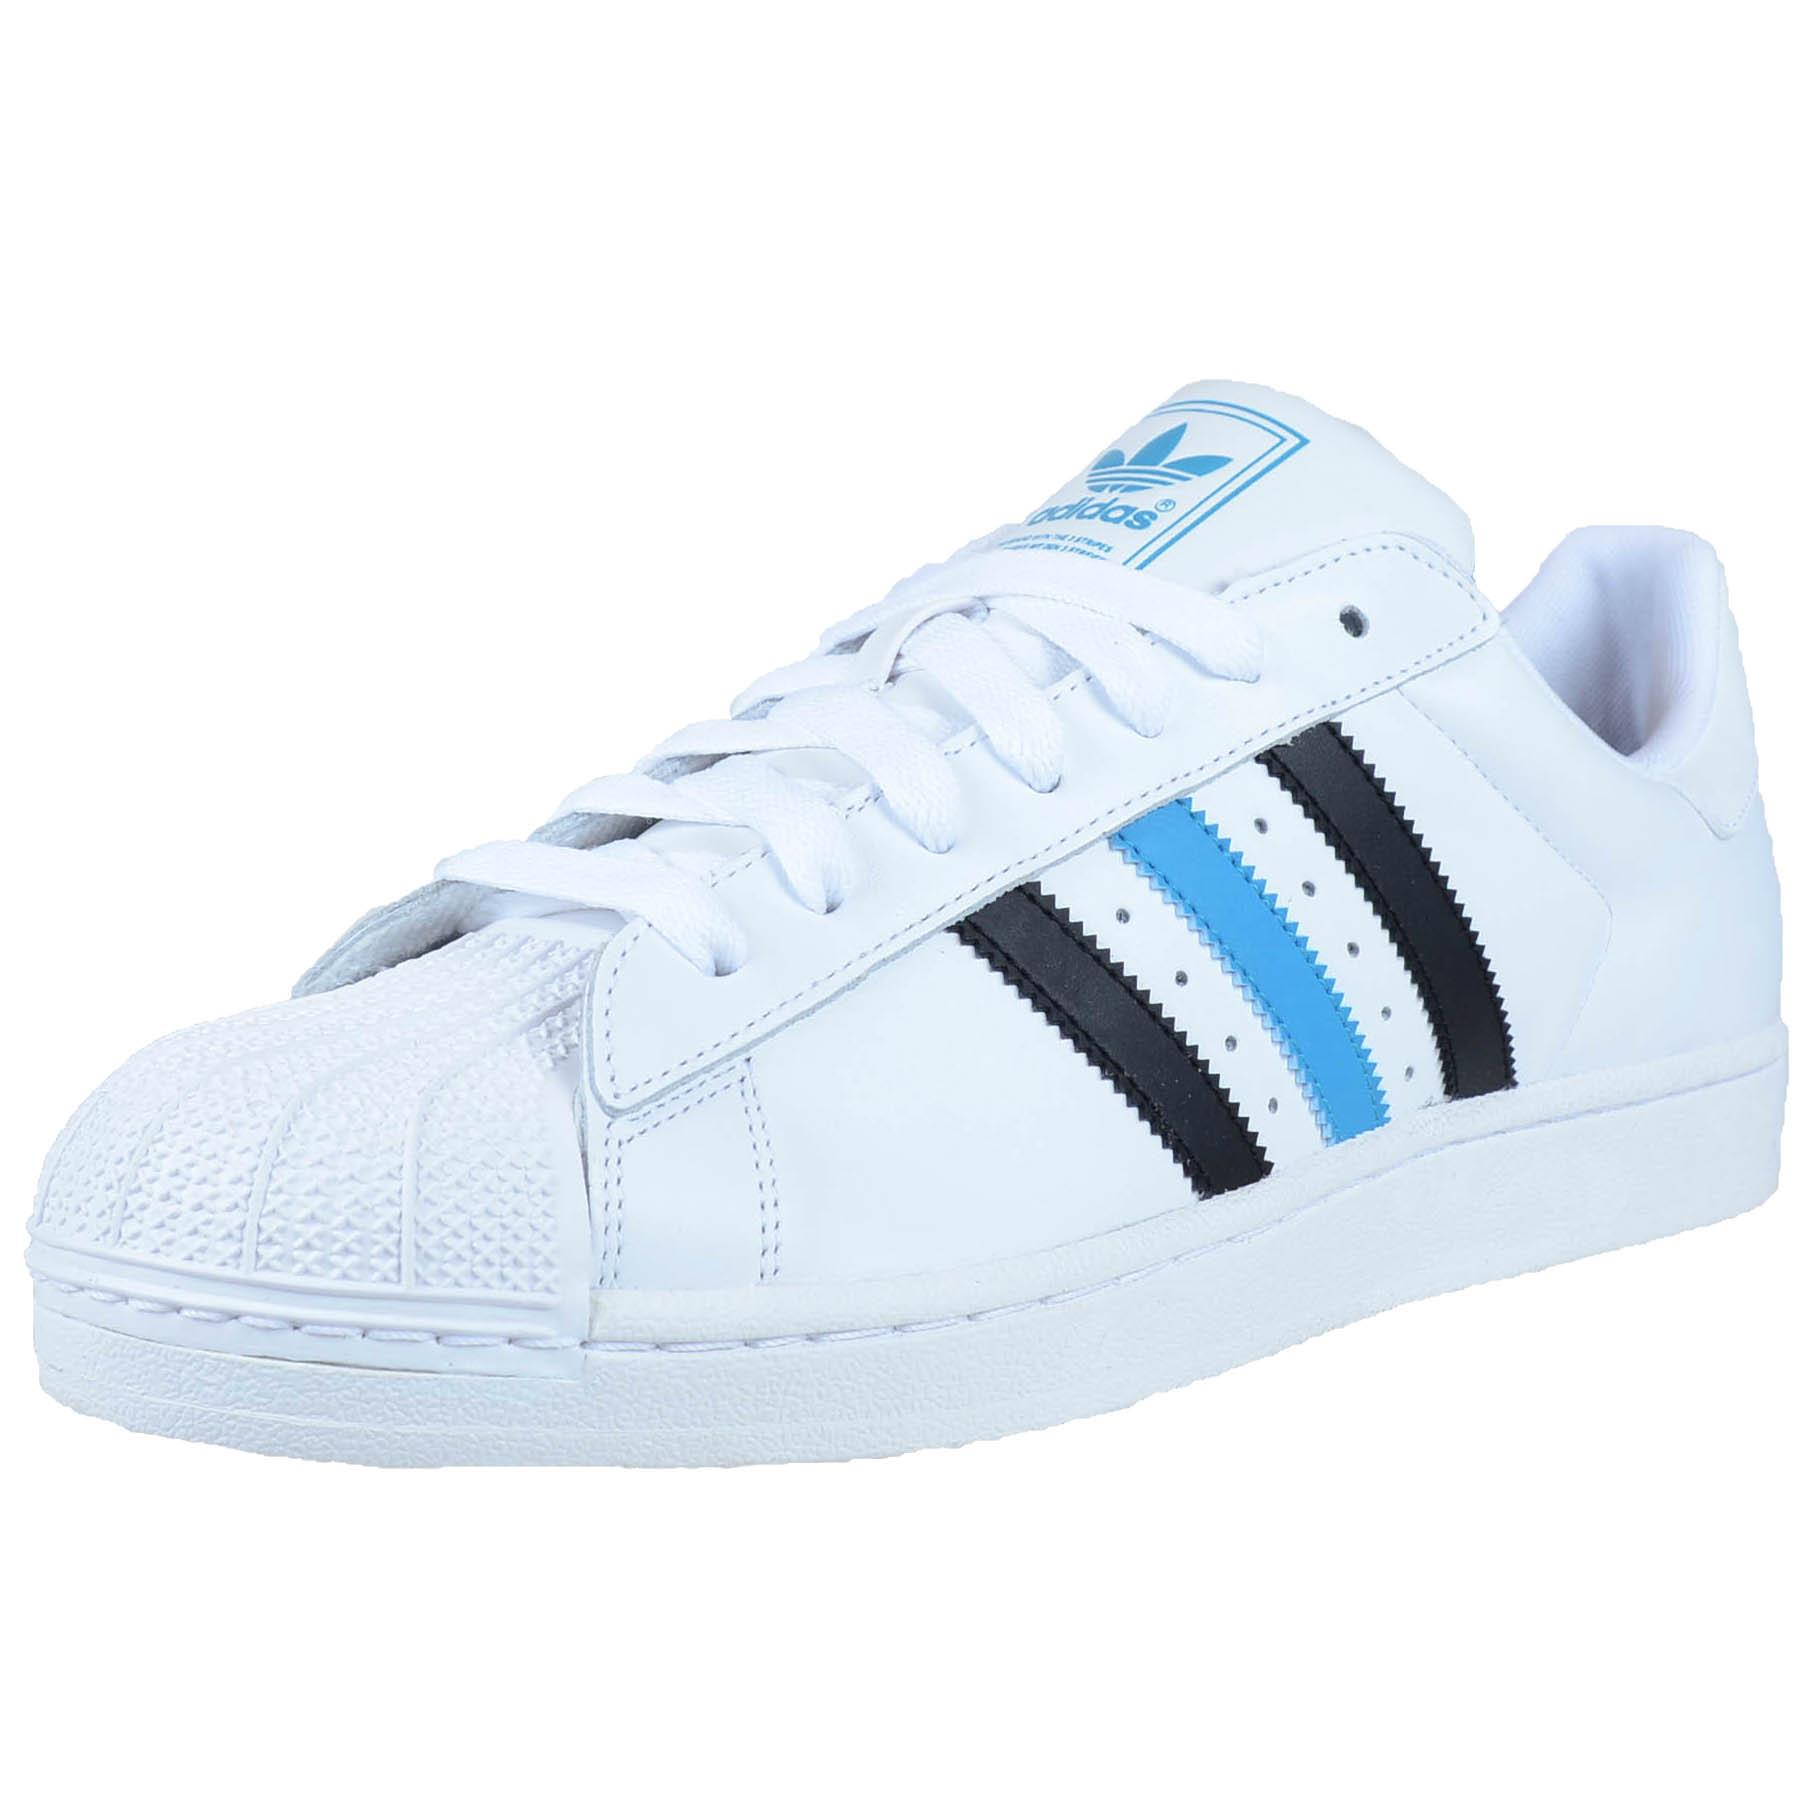 adidas superstar ii retro basketball shoes running white